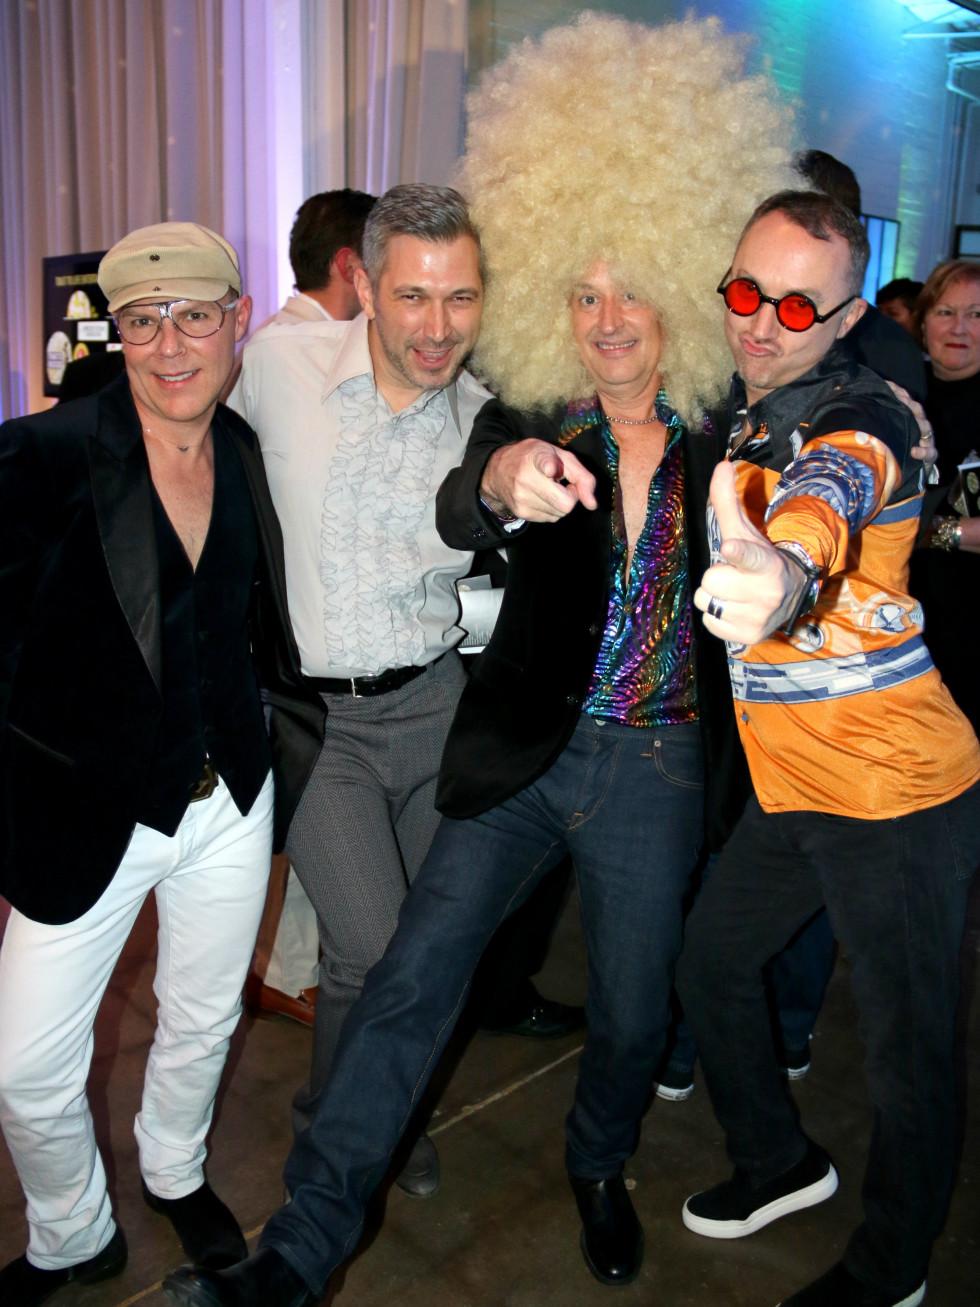 Scot Presley, Steve Rayl, Jim Dimrino, John Hodge